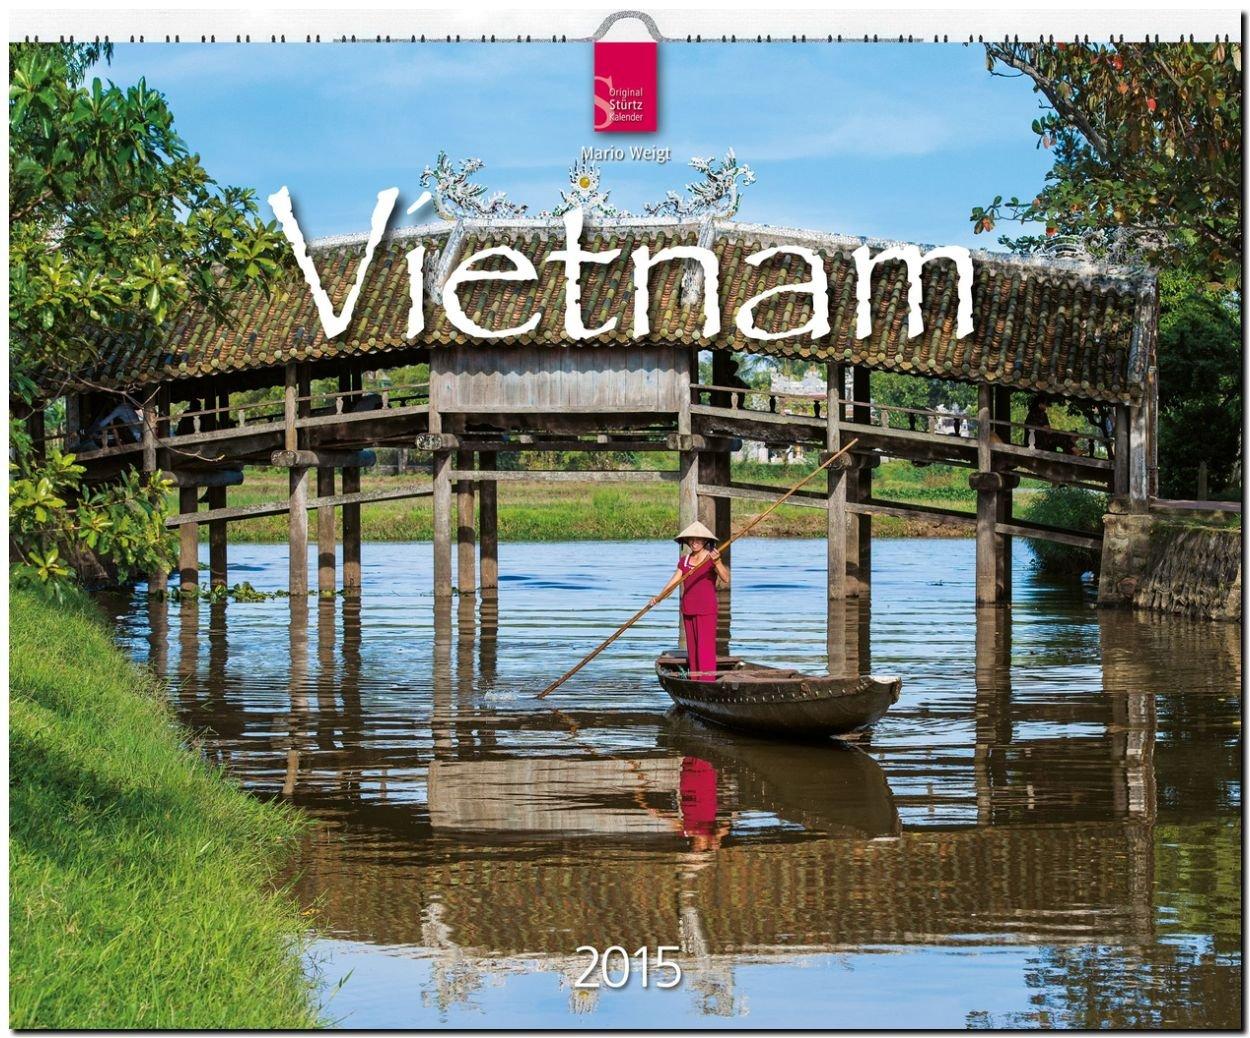 Vietnam 2015 - Original Stürtz-Kalender 2015 - Großformat-Kalender 60 x 48 cm